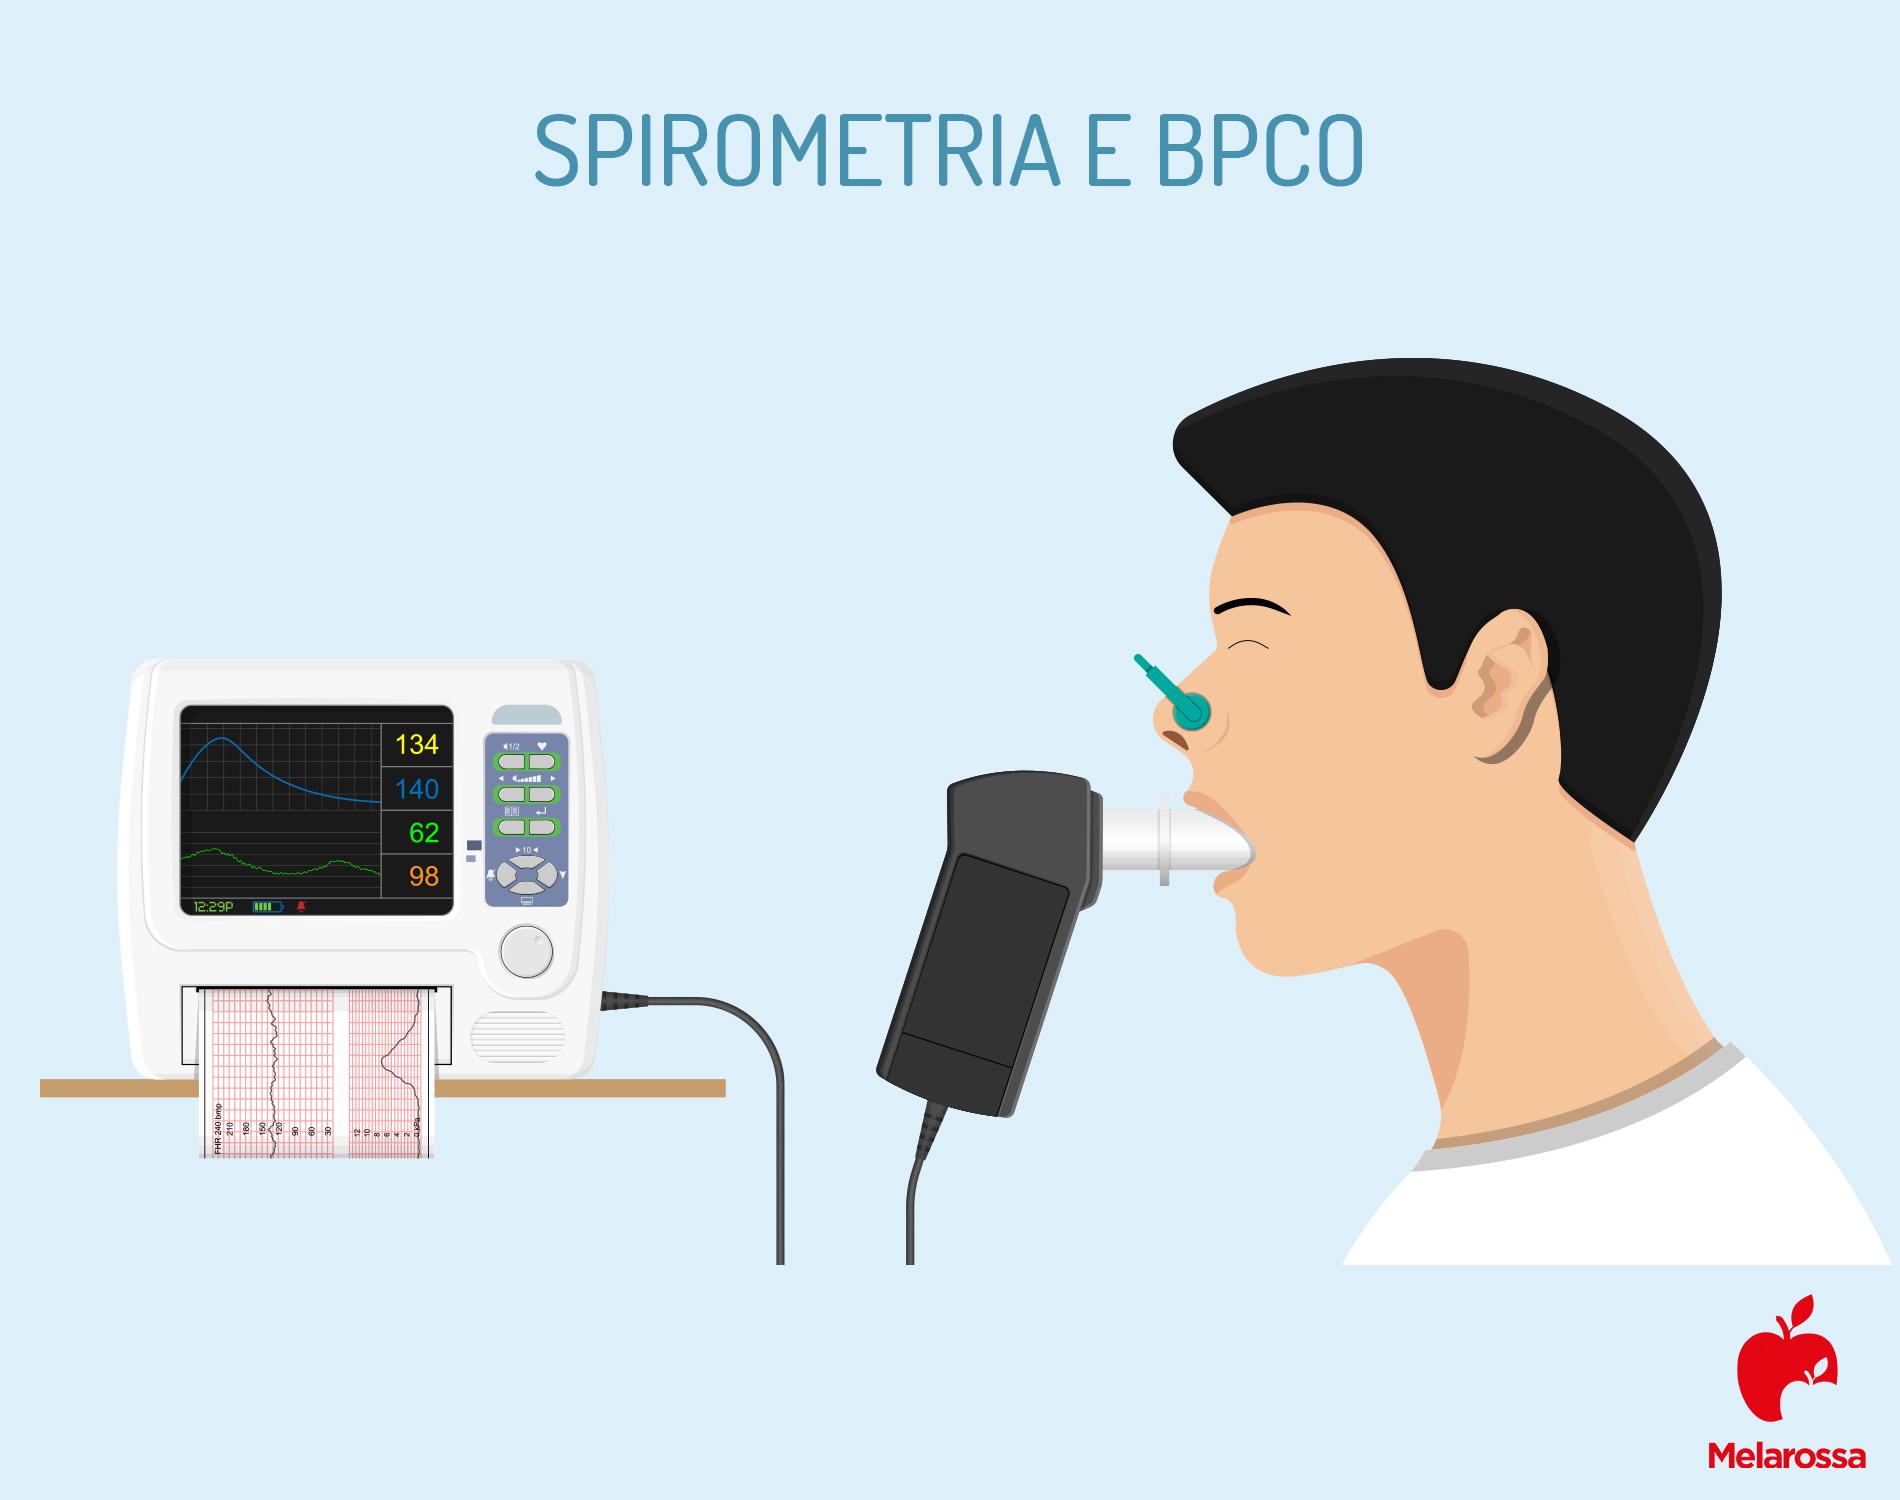 Broncopneumopatia cronica ostruttiva spirometria